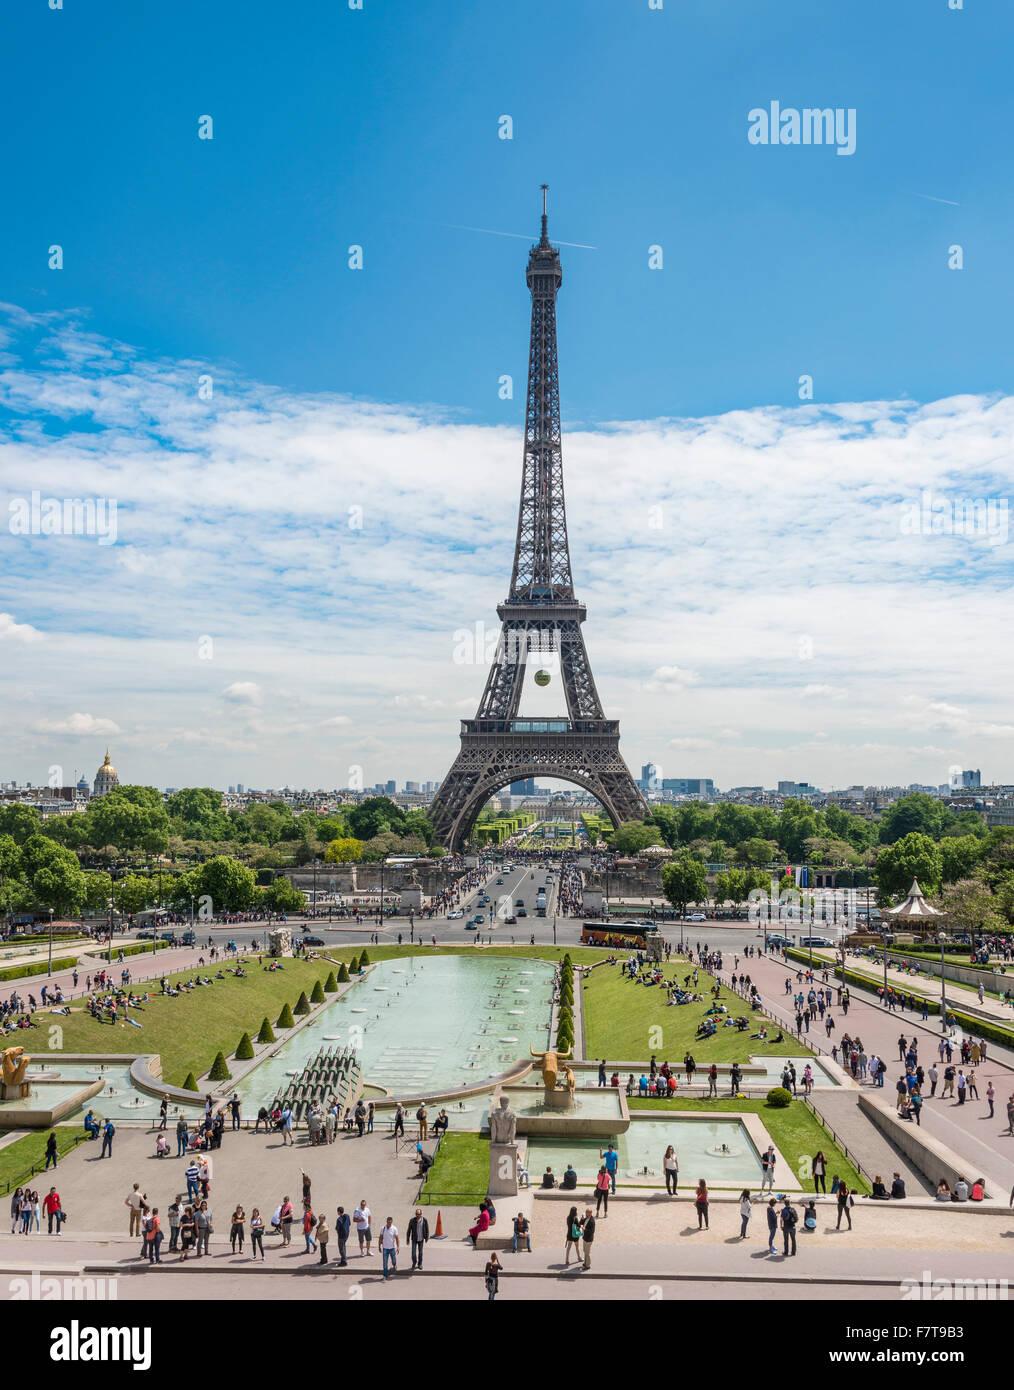 La Tour Eiffel Tour Eiffel Trocadero Les Jardins Du Trocadero